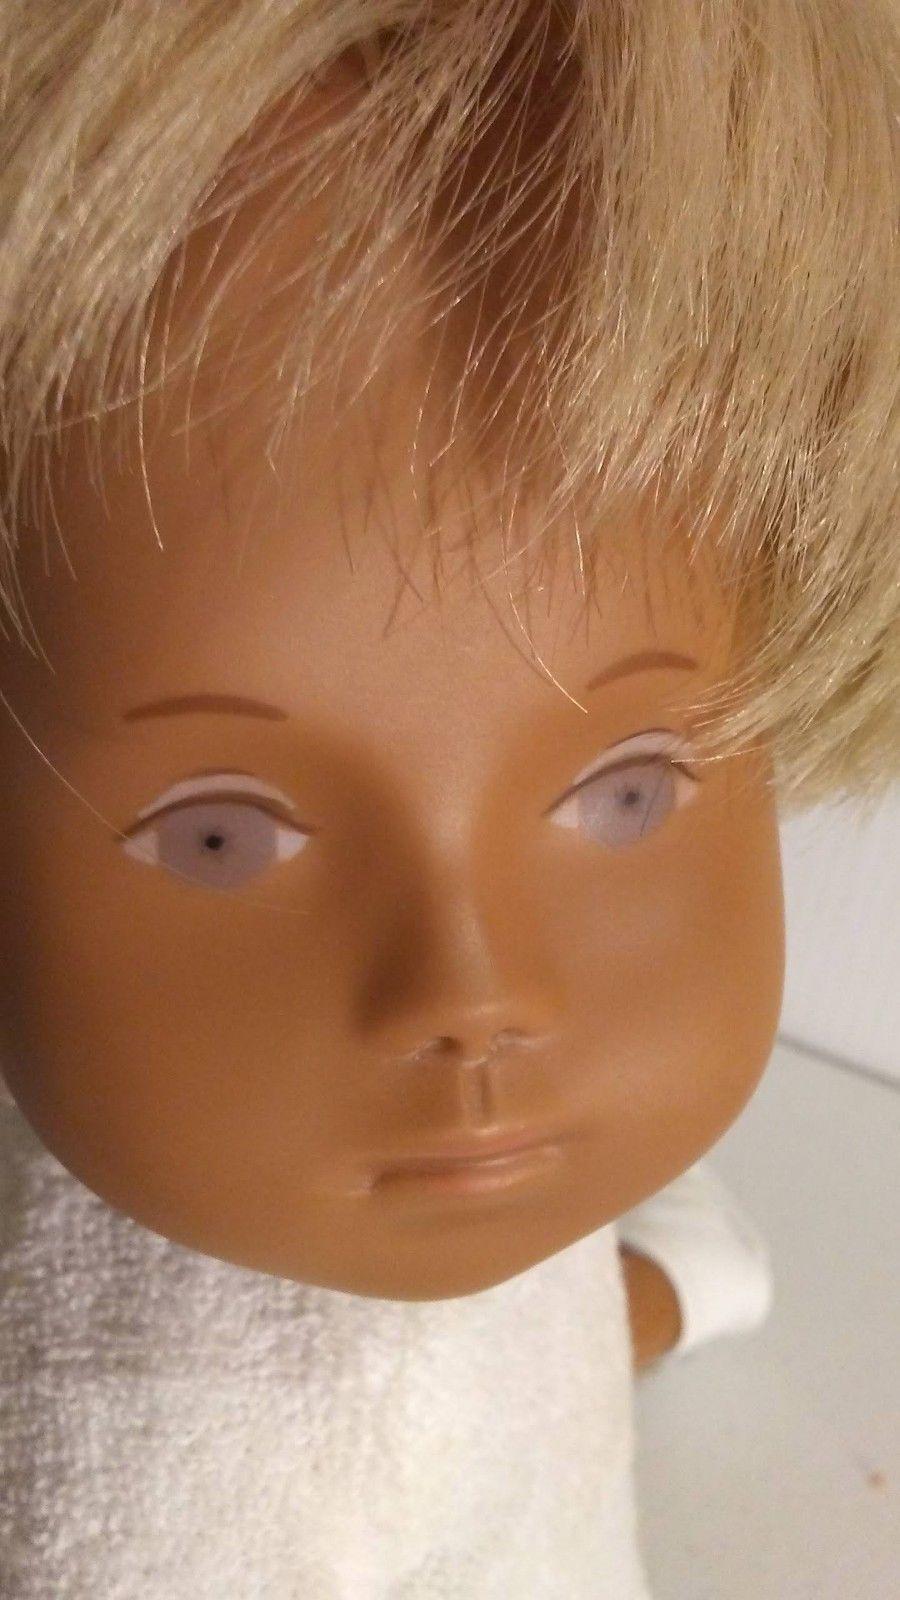 Little Patrick Has Blonde Fair Hair And Blue Eyes Blonde Hair